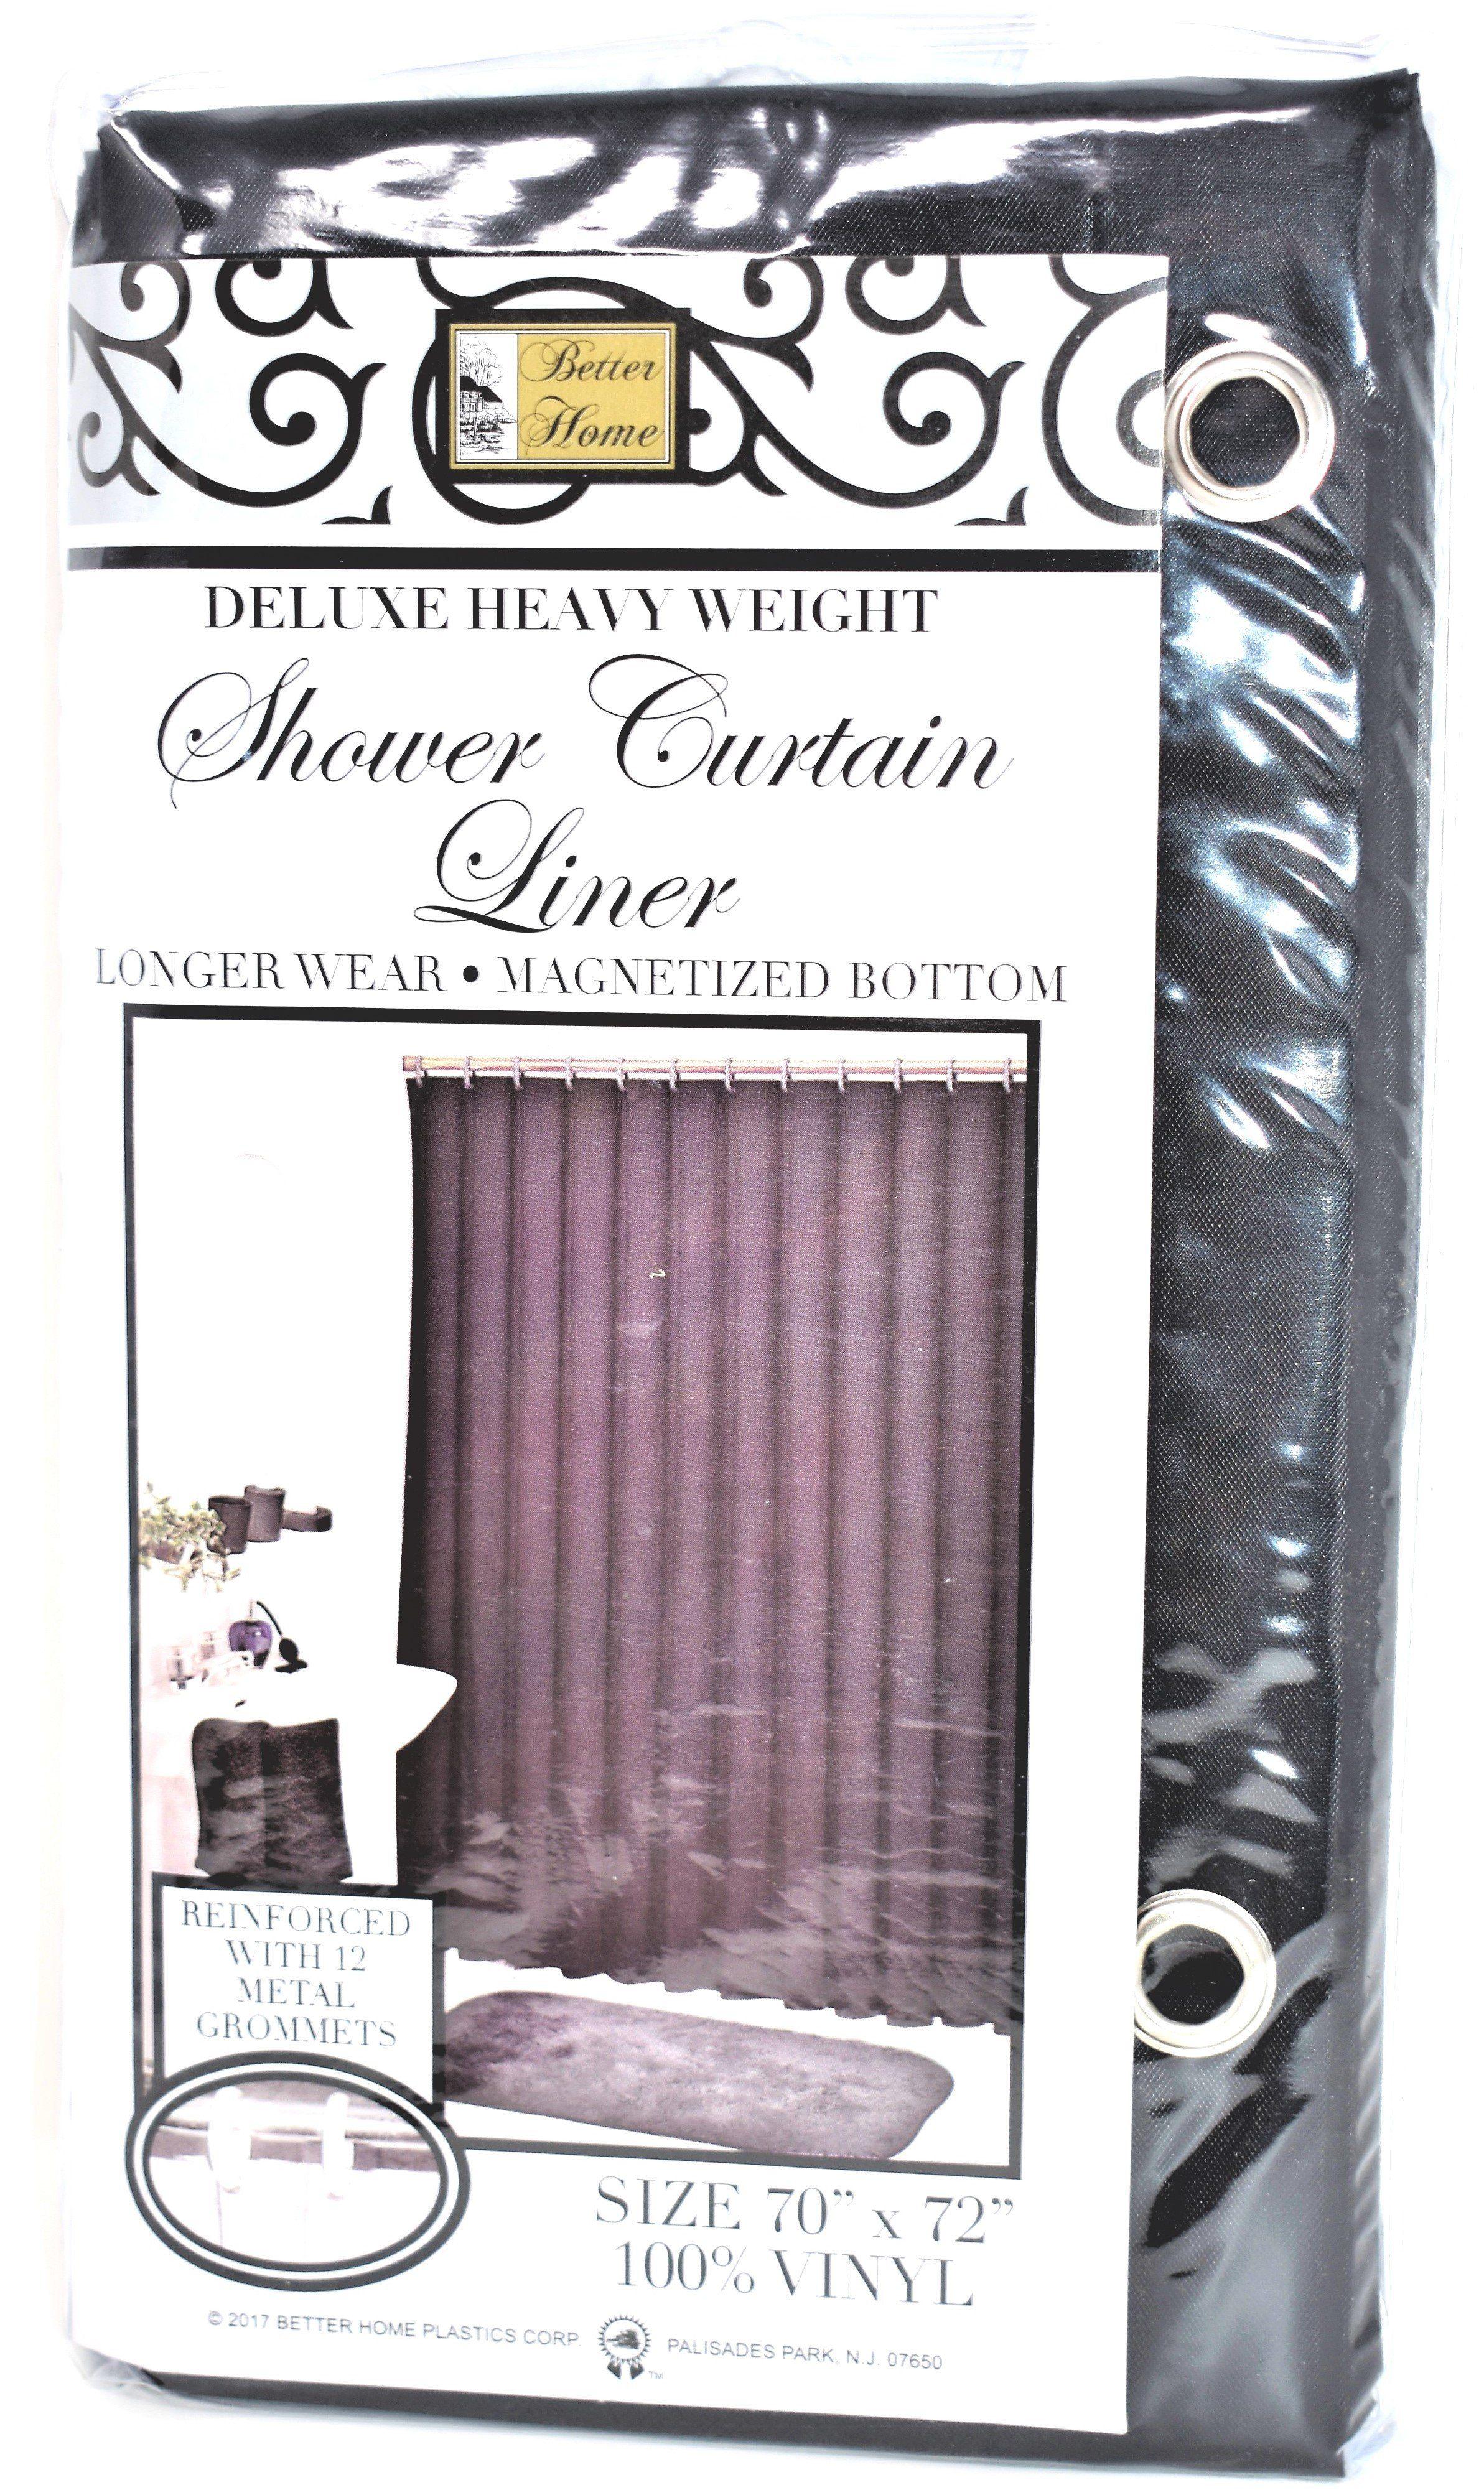 Deluxe Heavy Weight 100 Vinyl Shower Curtain Liner 70 X 72